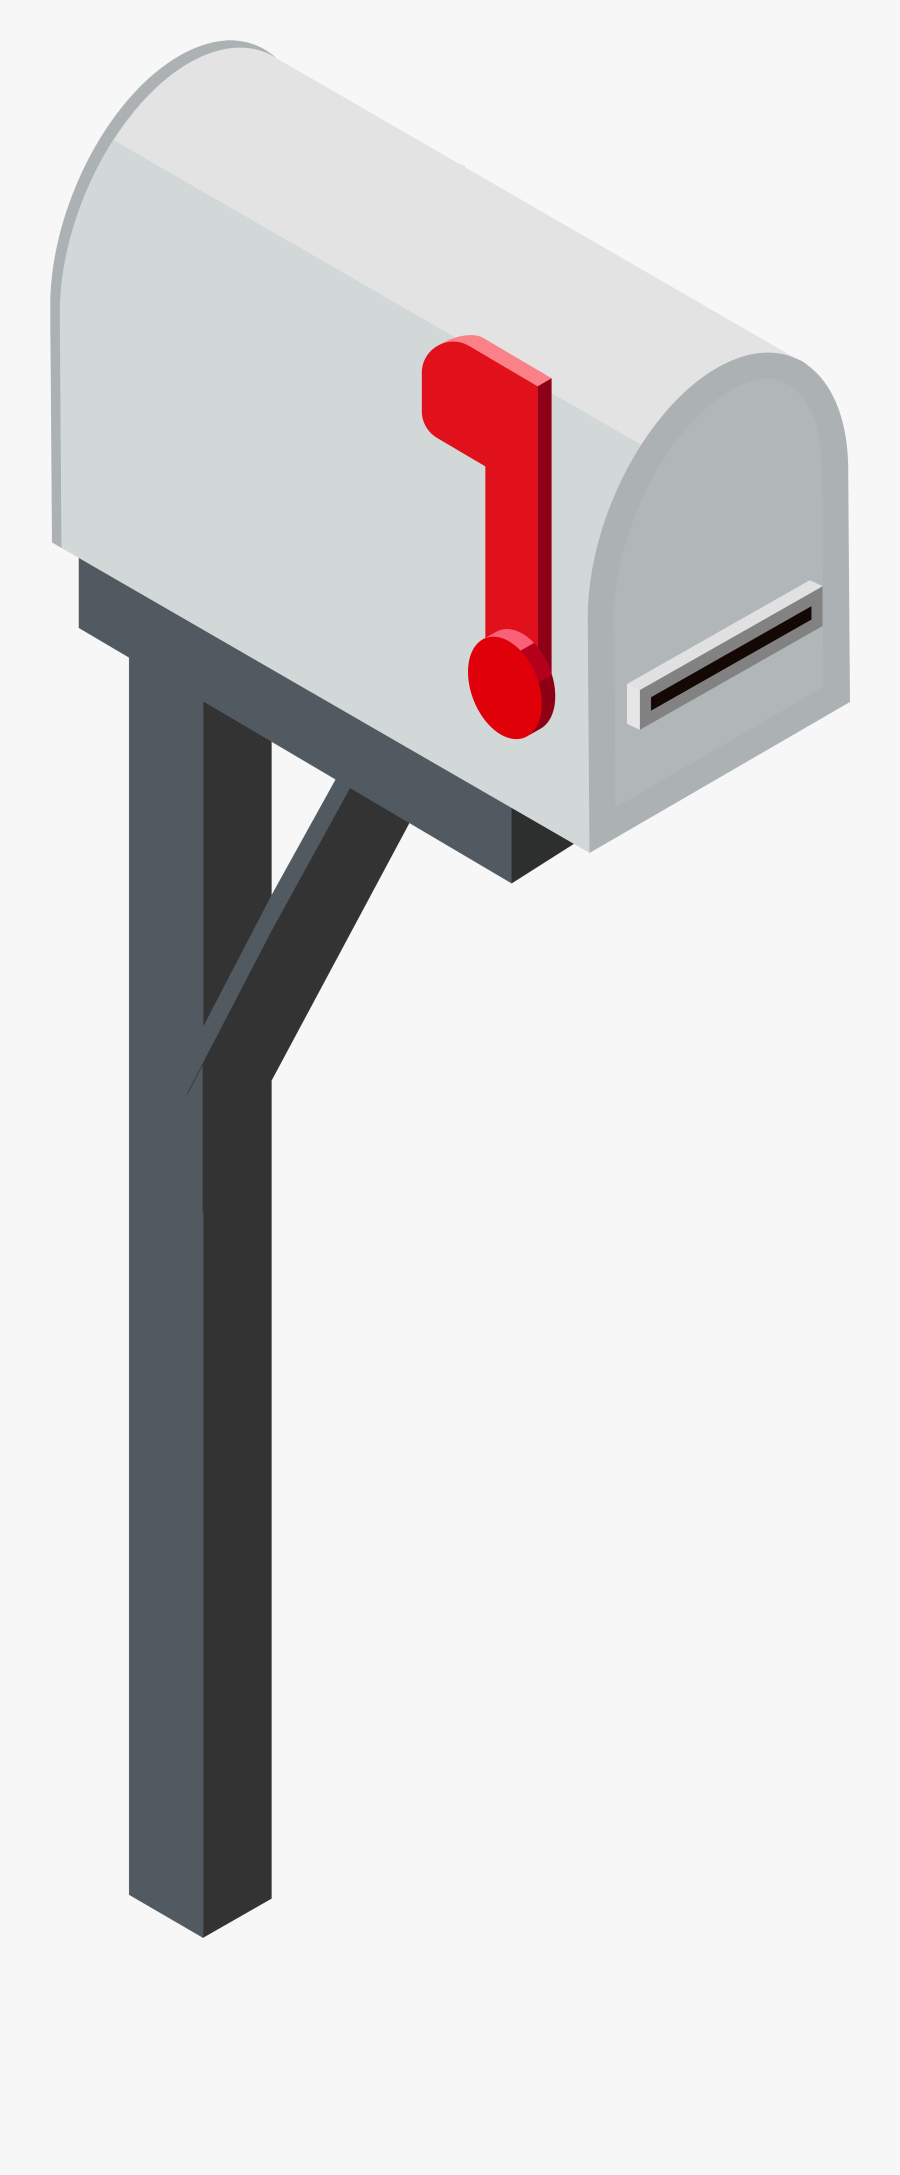 Mailbox Png Clip Art - Transparent Background Mailbox Clipart, Transparent Clipart